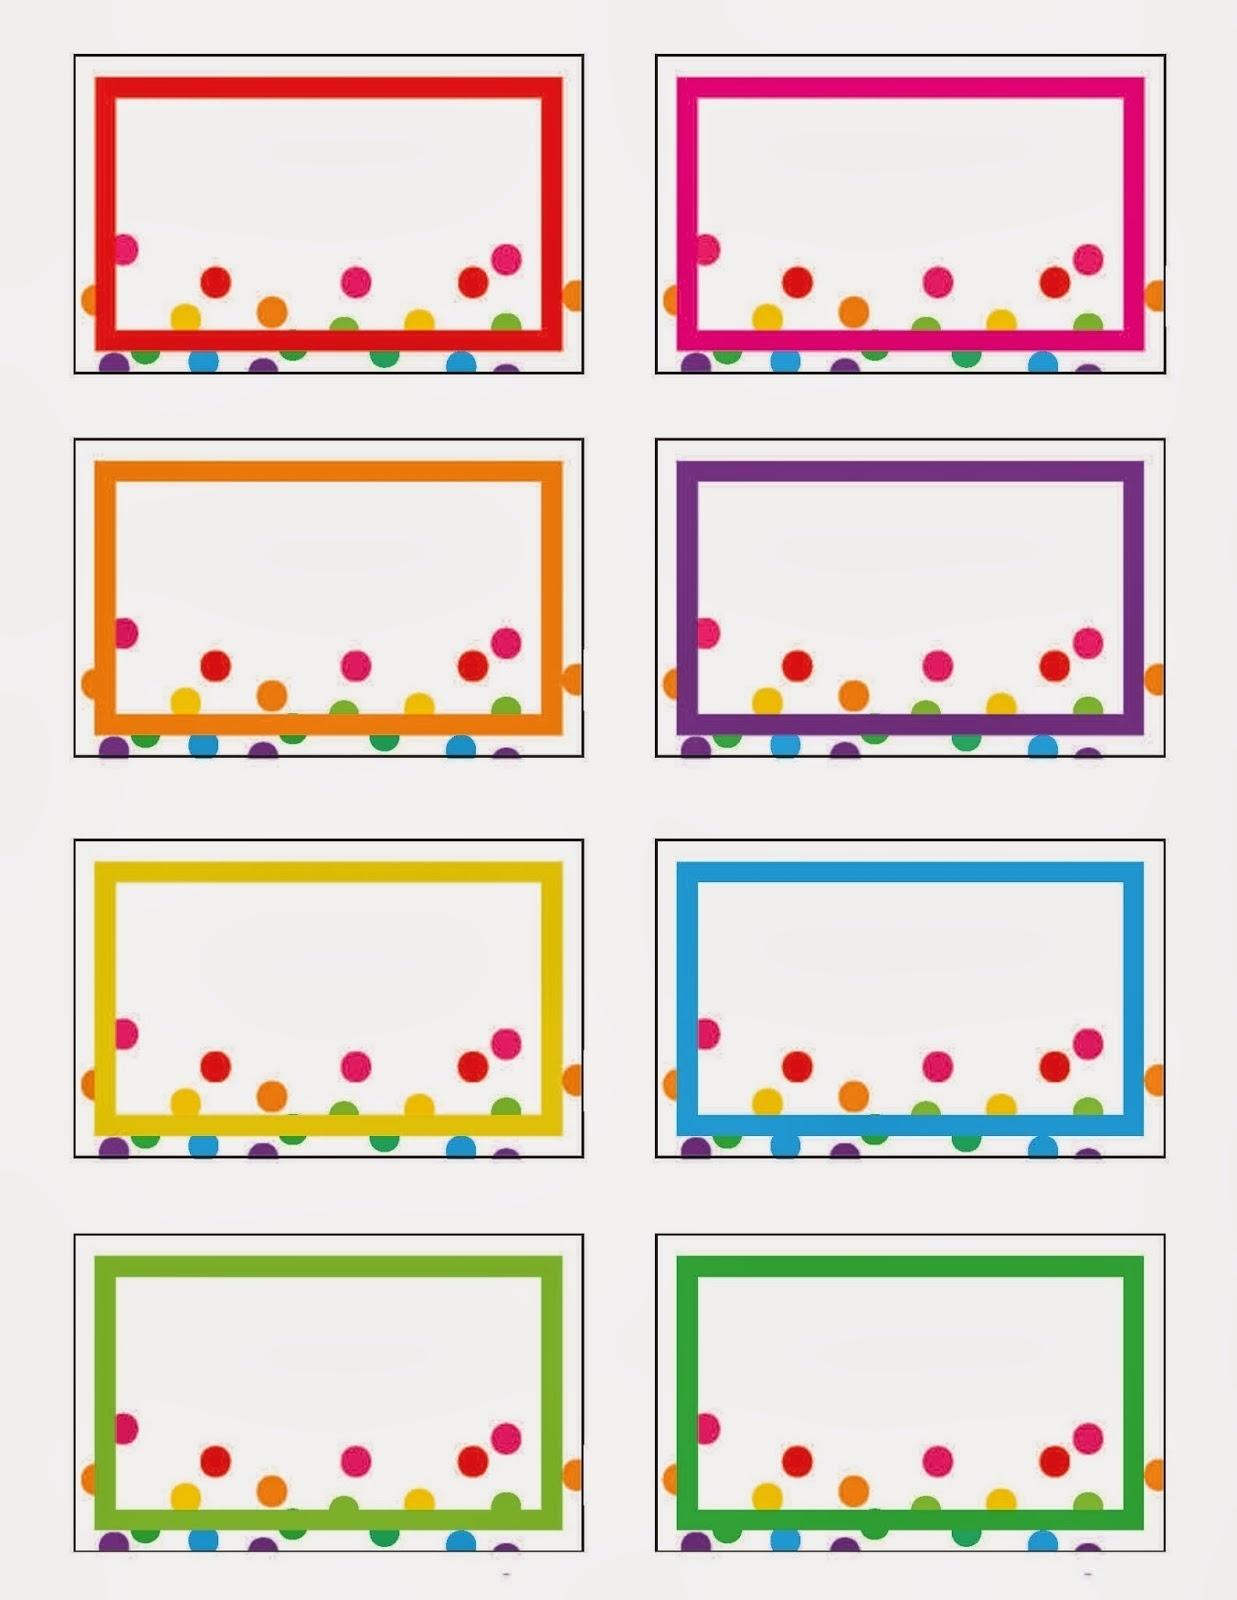 013 Free Printable Rainbow Label Templates Within For Kids Template - Free Printable Label Templates